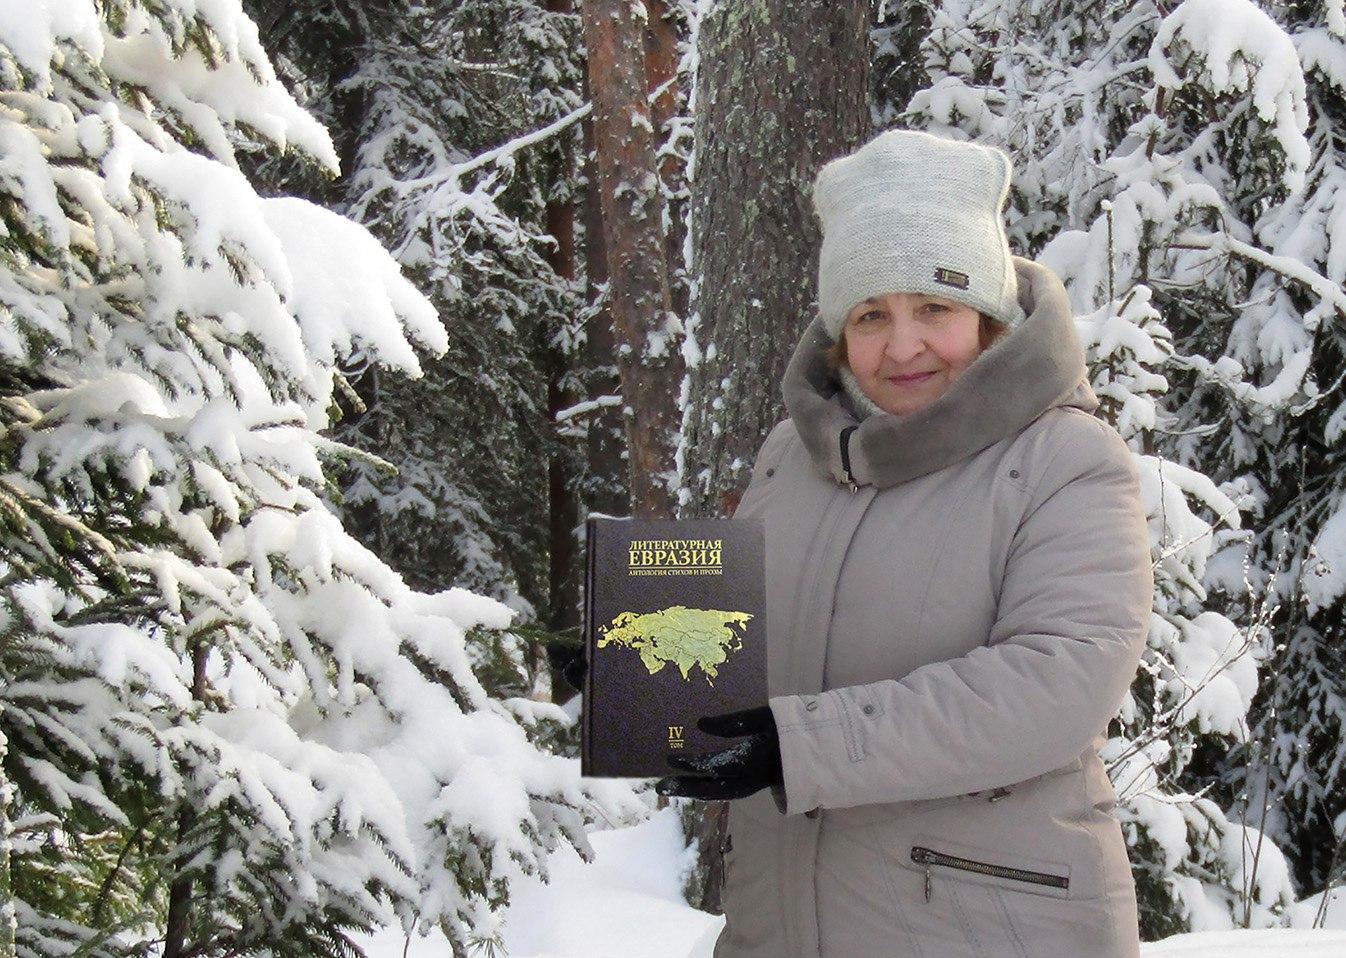 Светлана Епифанова